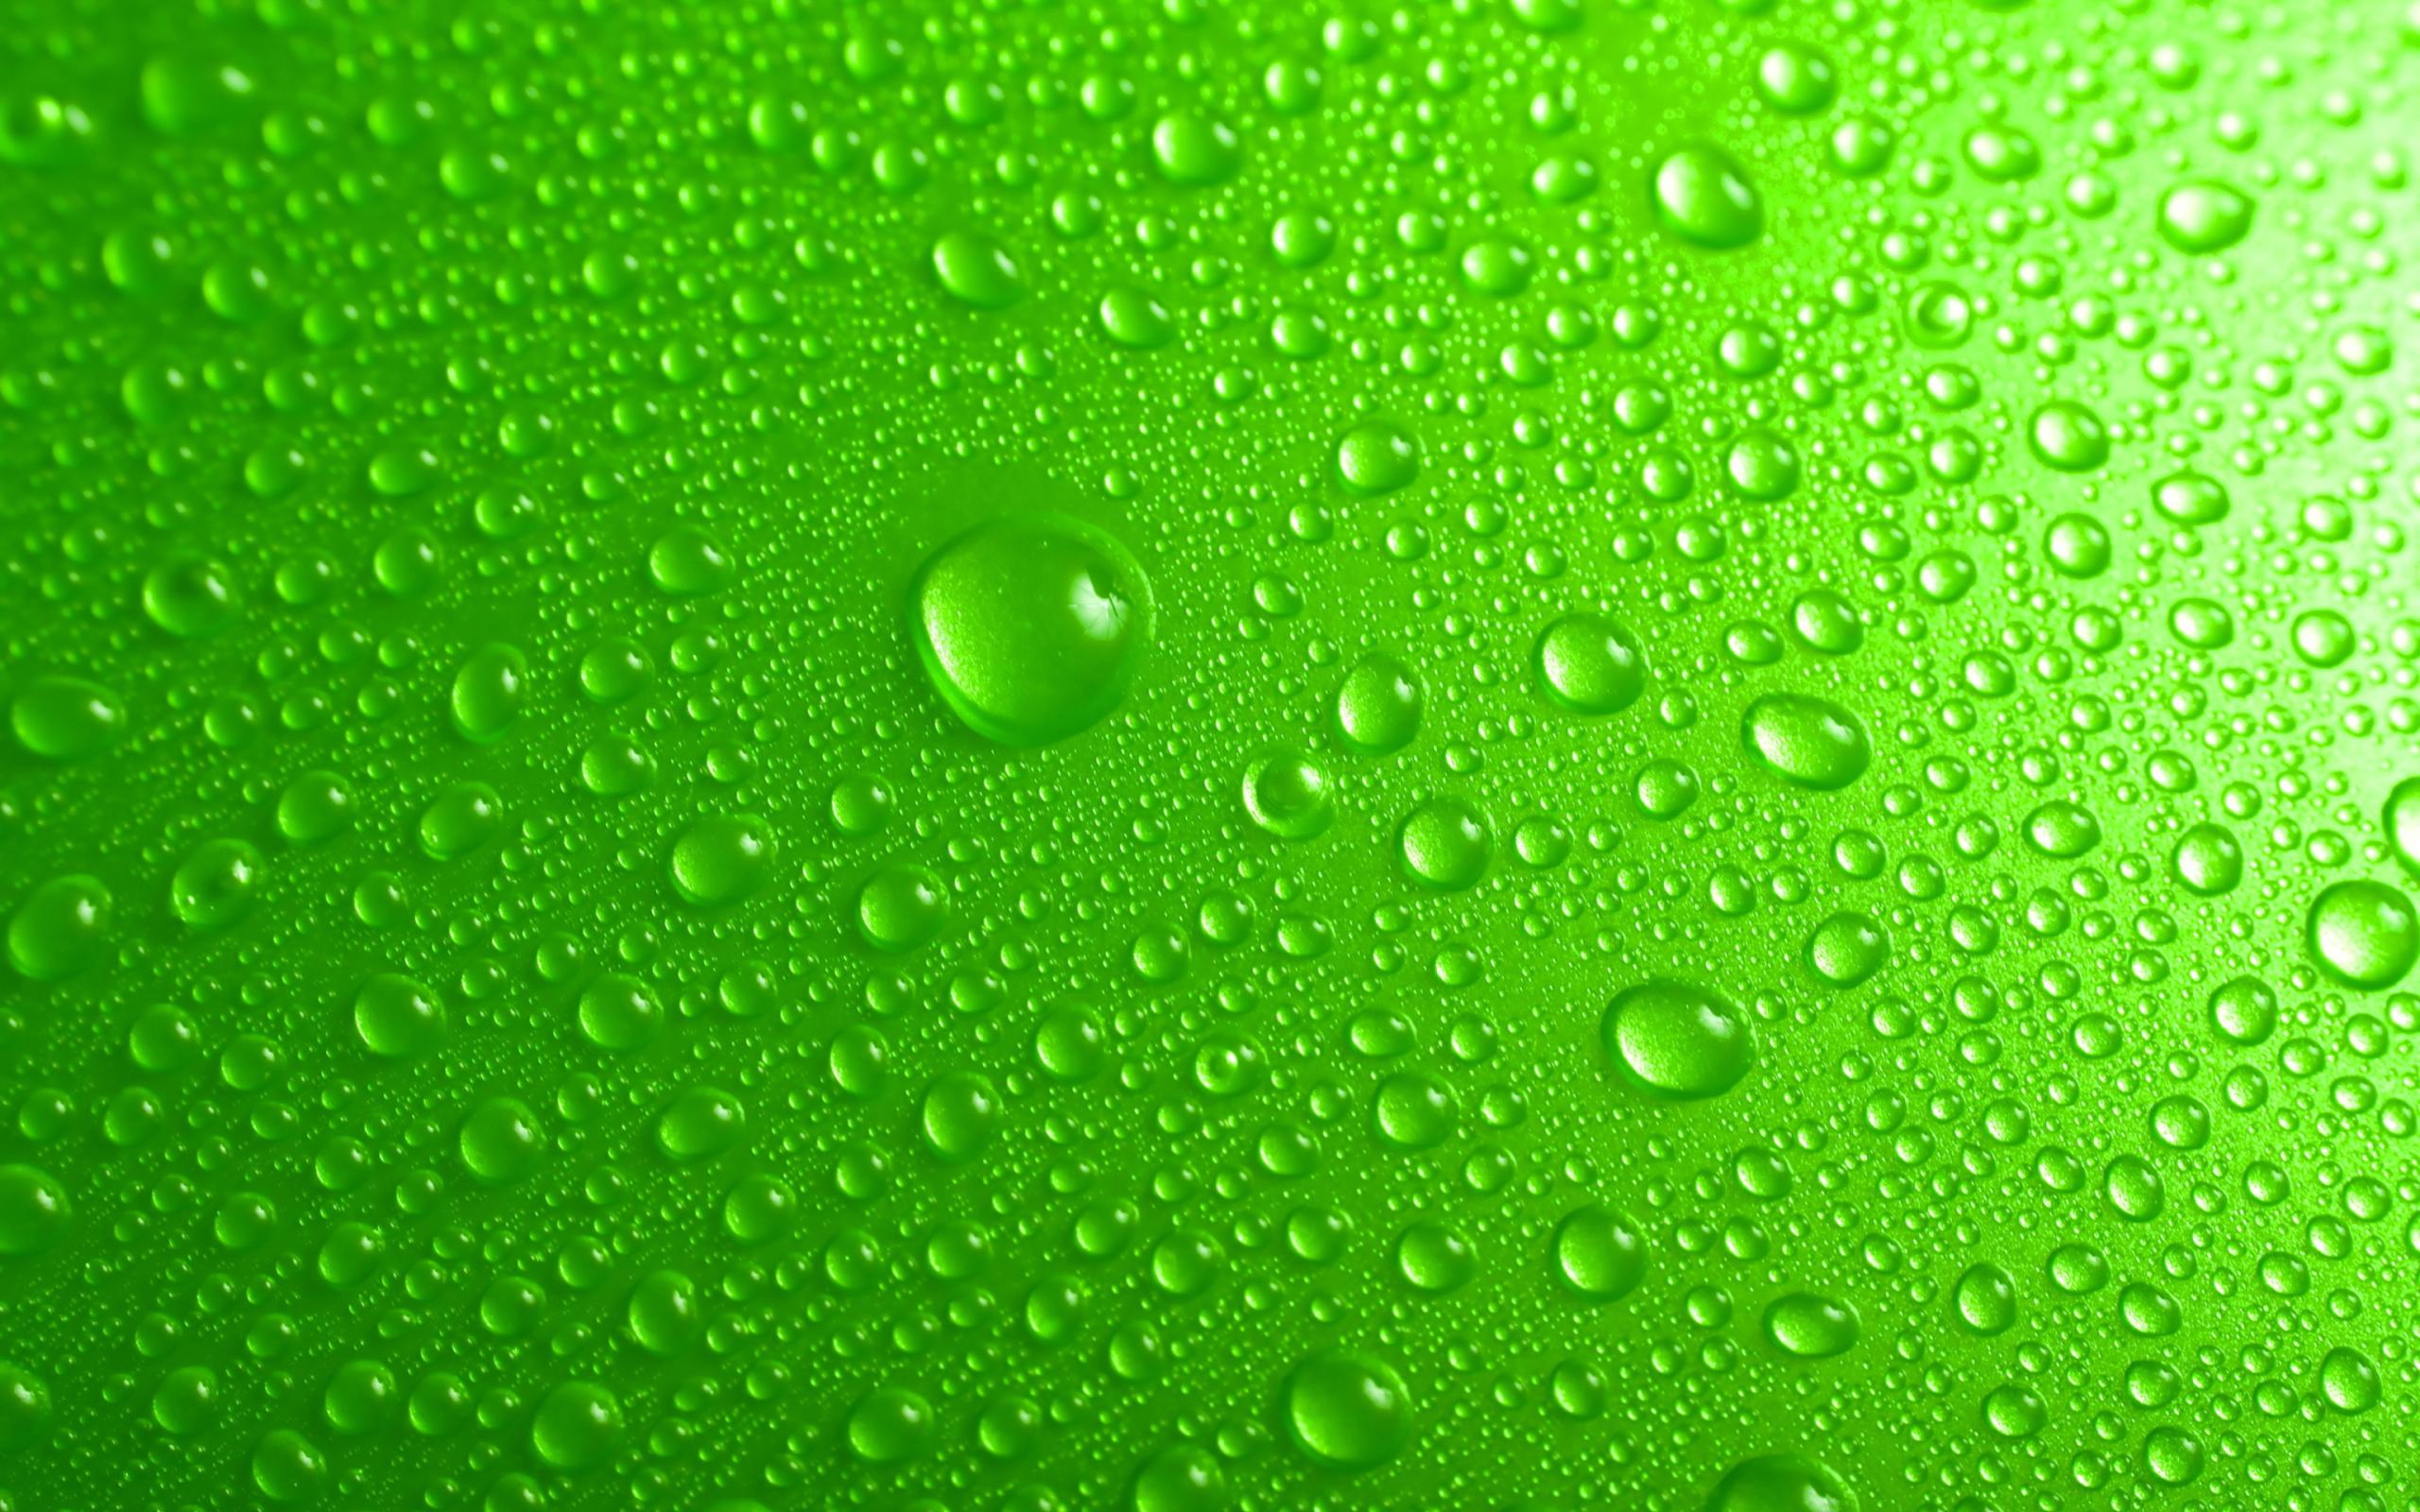 перфоратором картинка на телефон зеленого цвета тому же, пауки